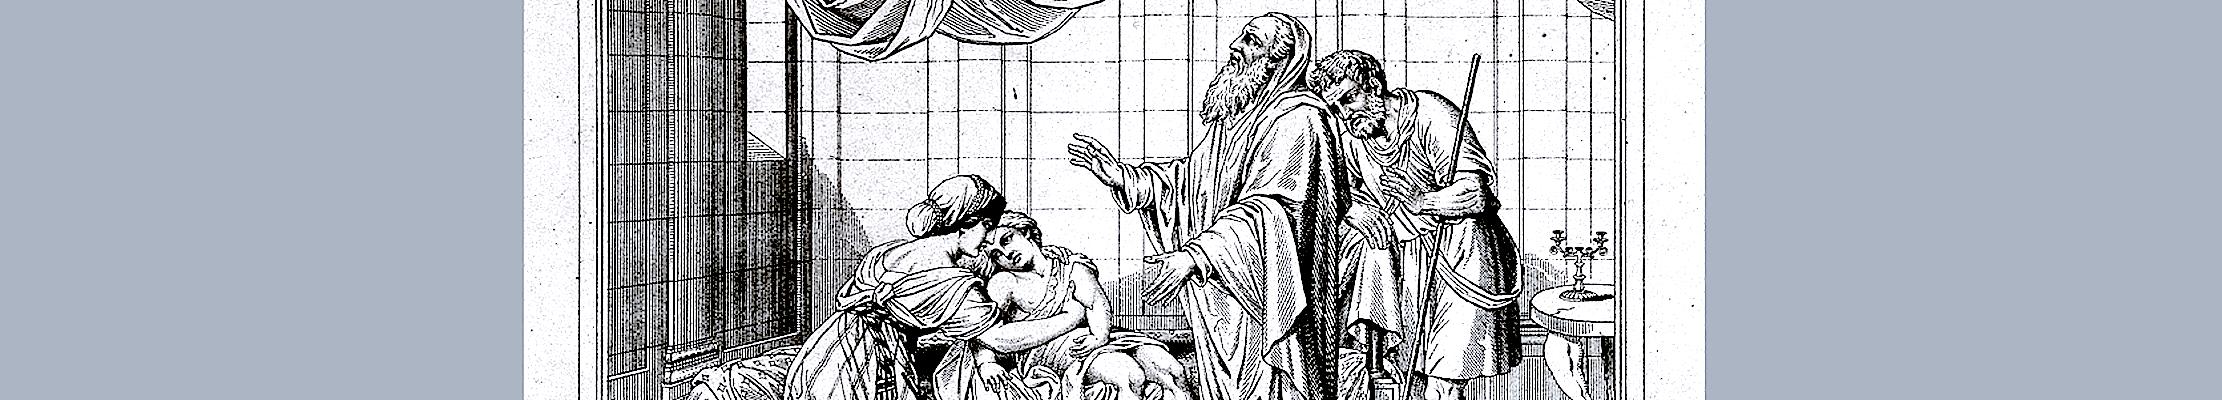 Елисей и Сонамитянка.